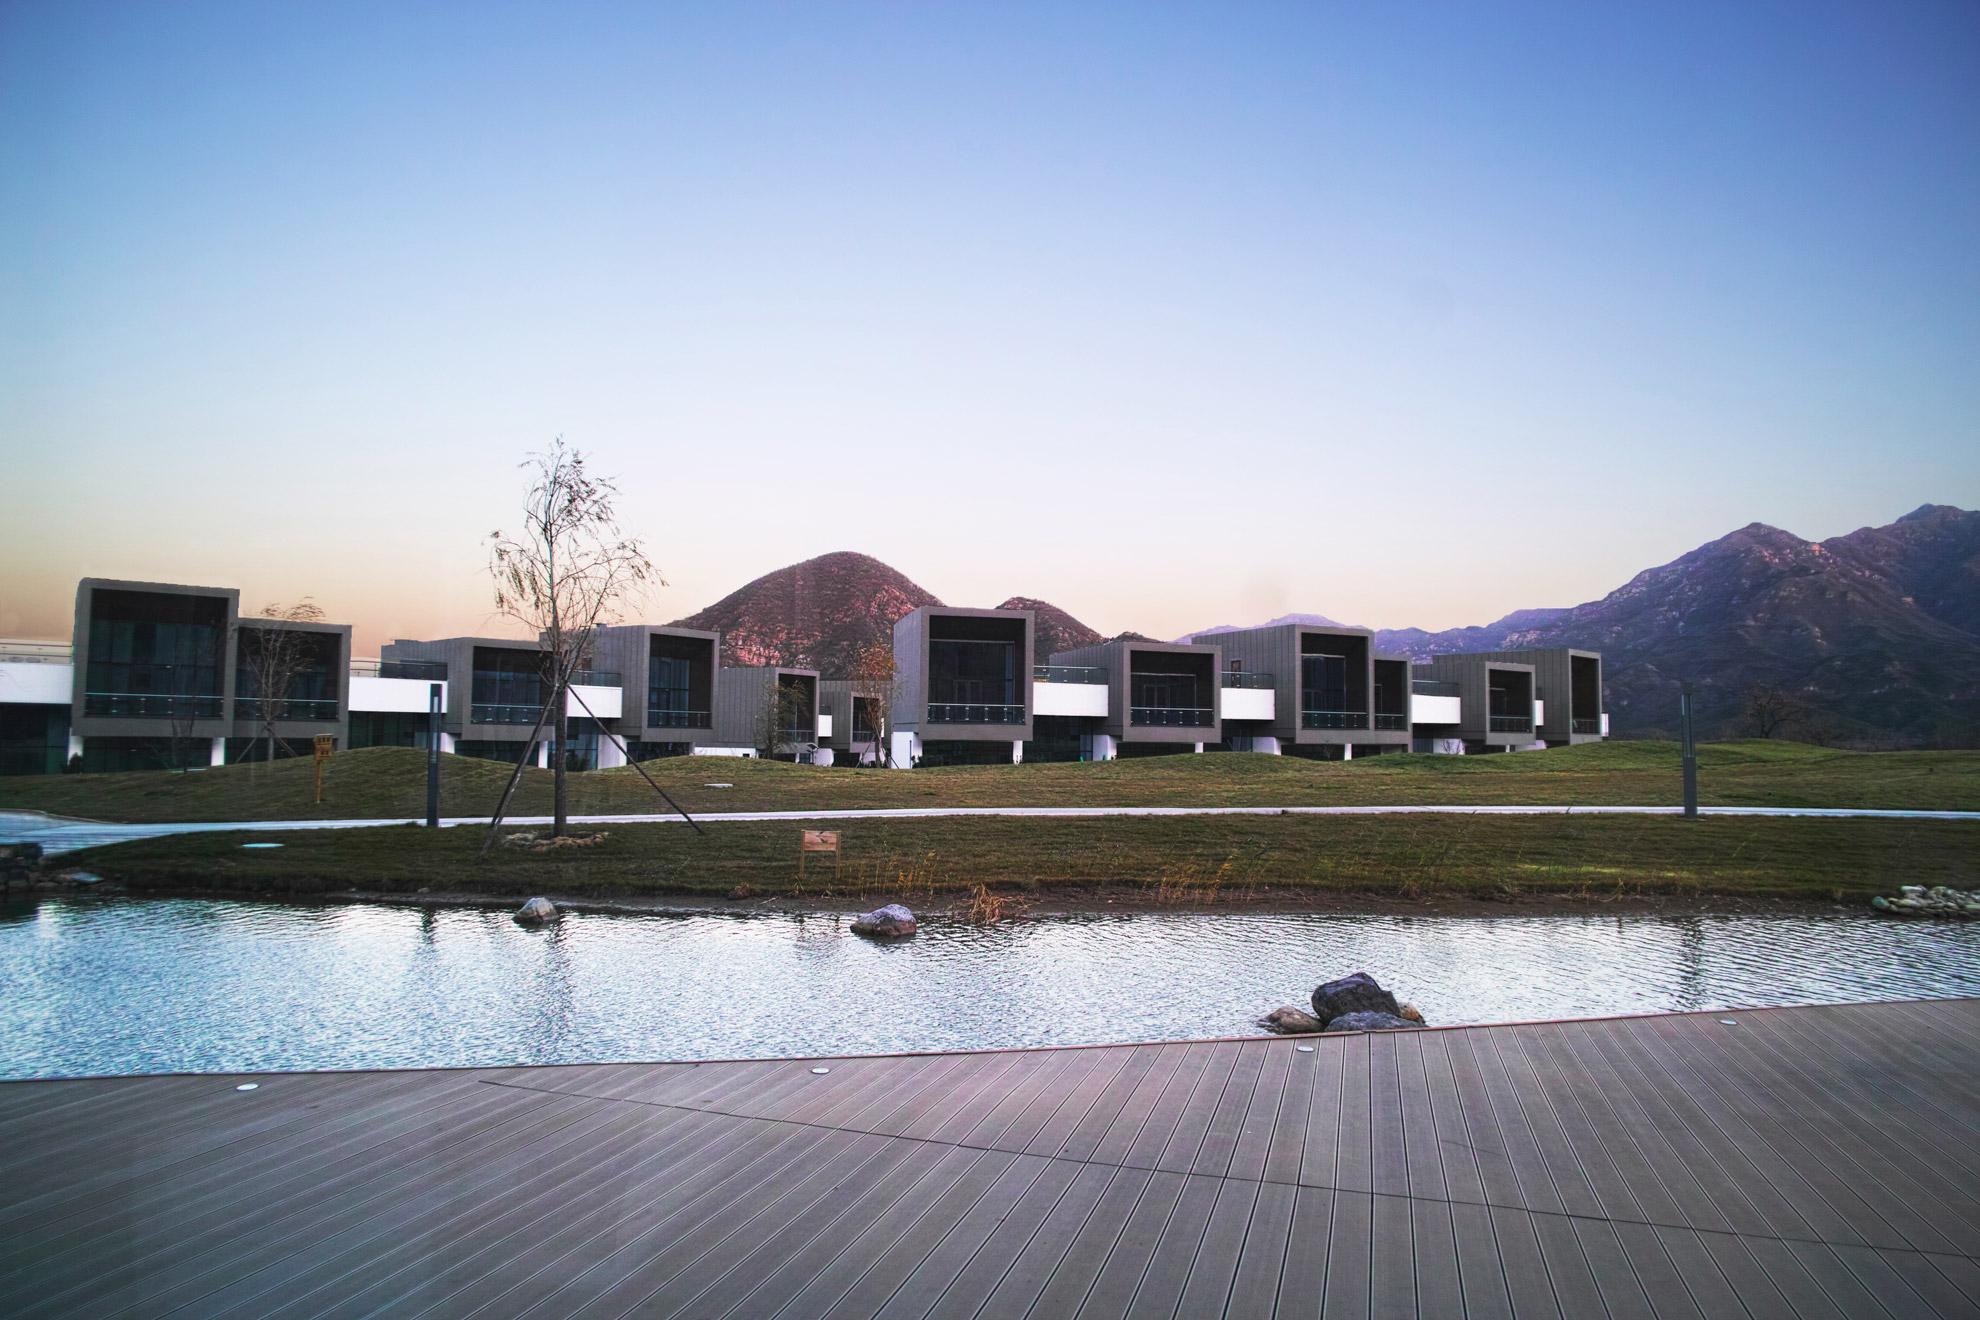 waa The Valley Resort Beijing 未觉建筑 北京 渔山国际温泉度假村